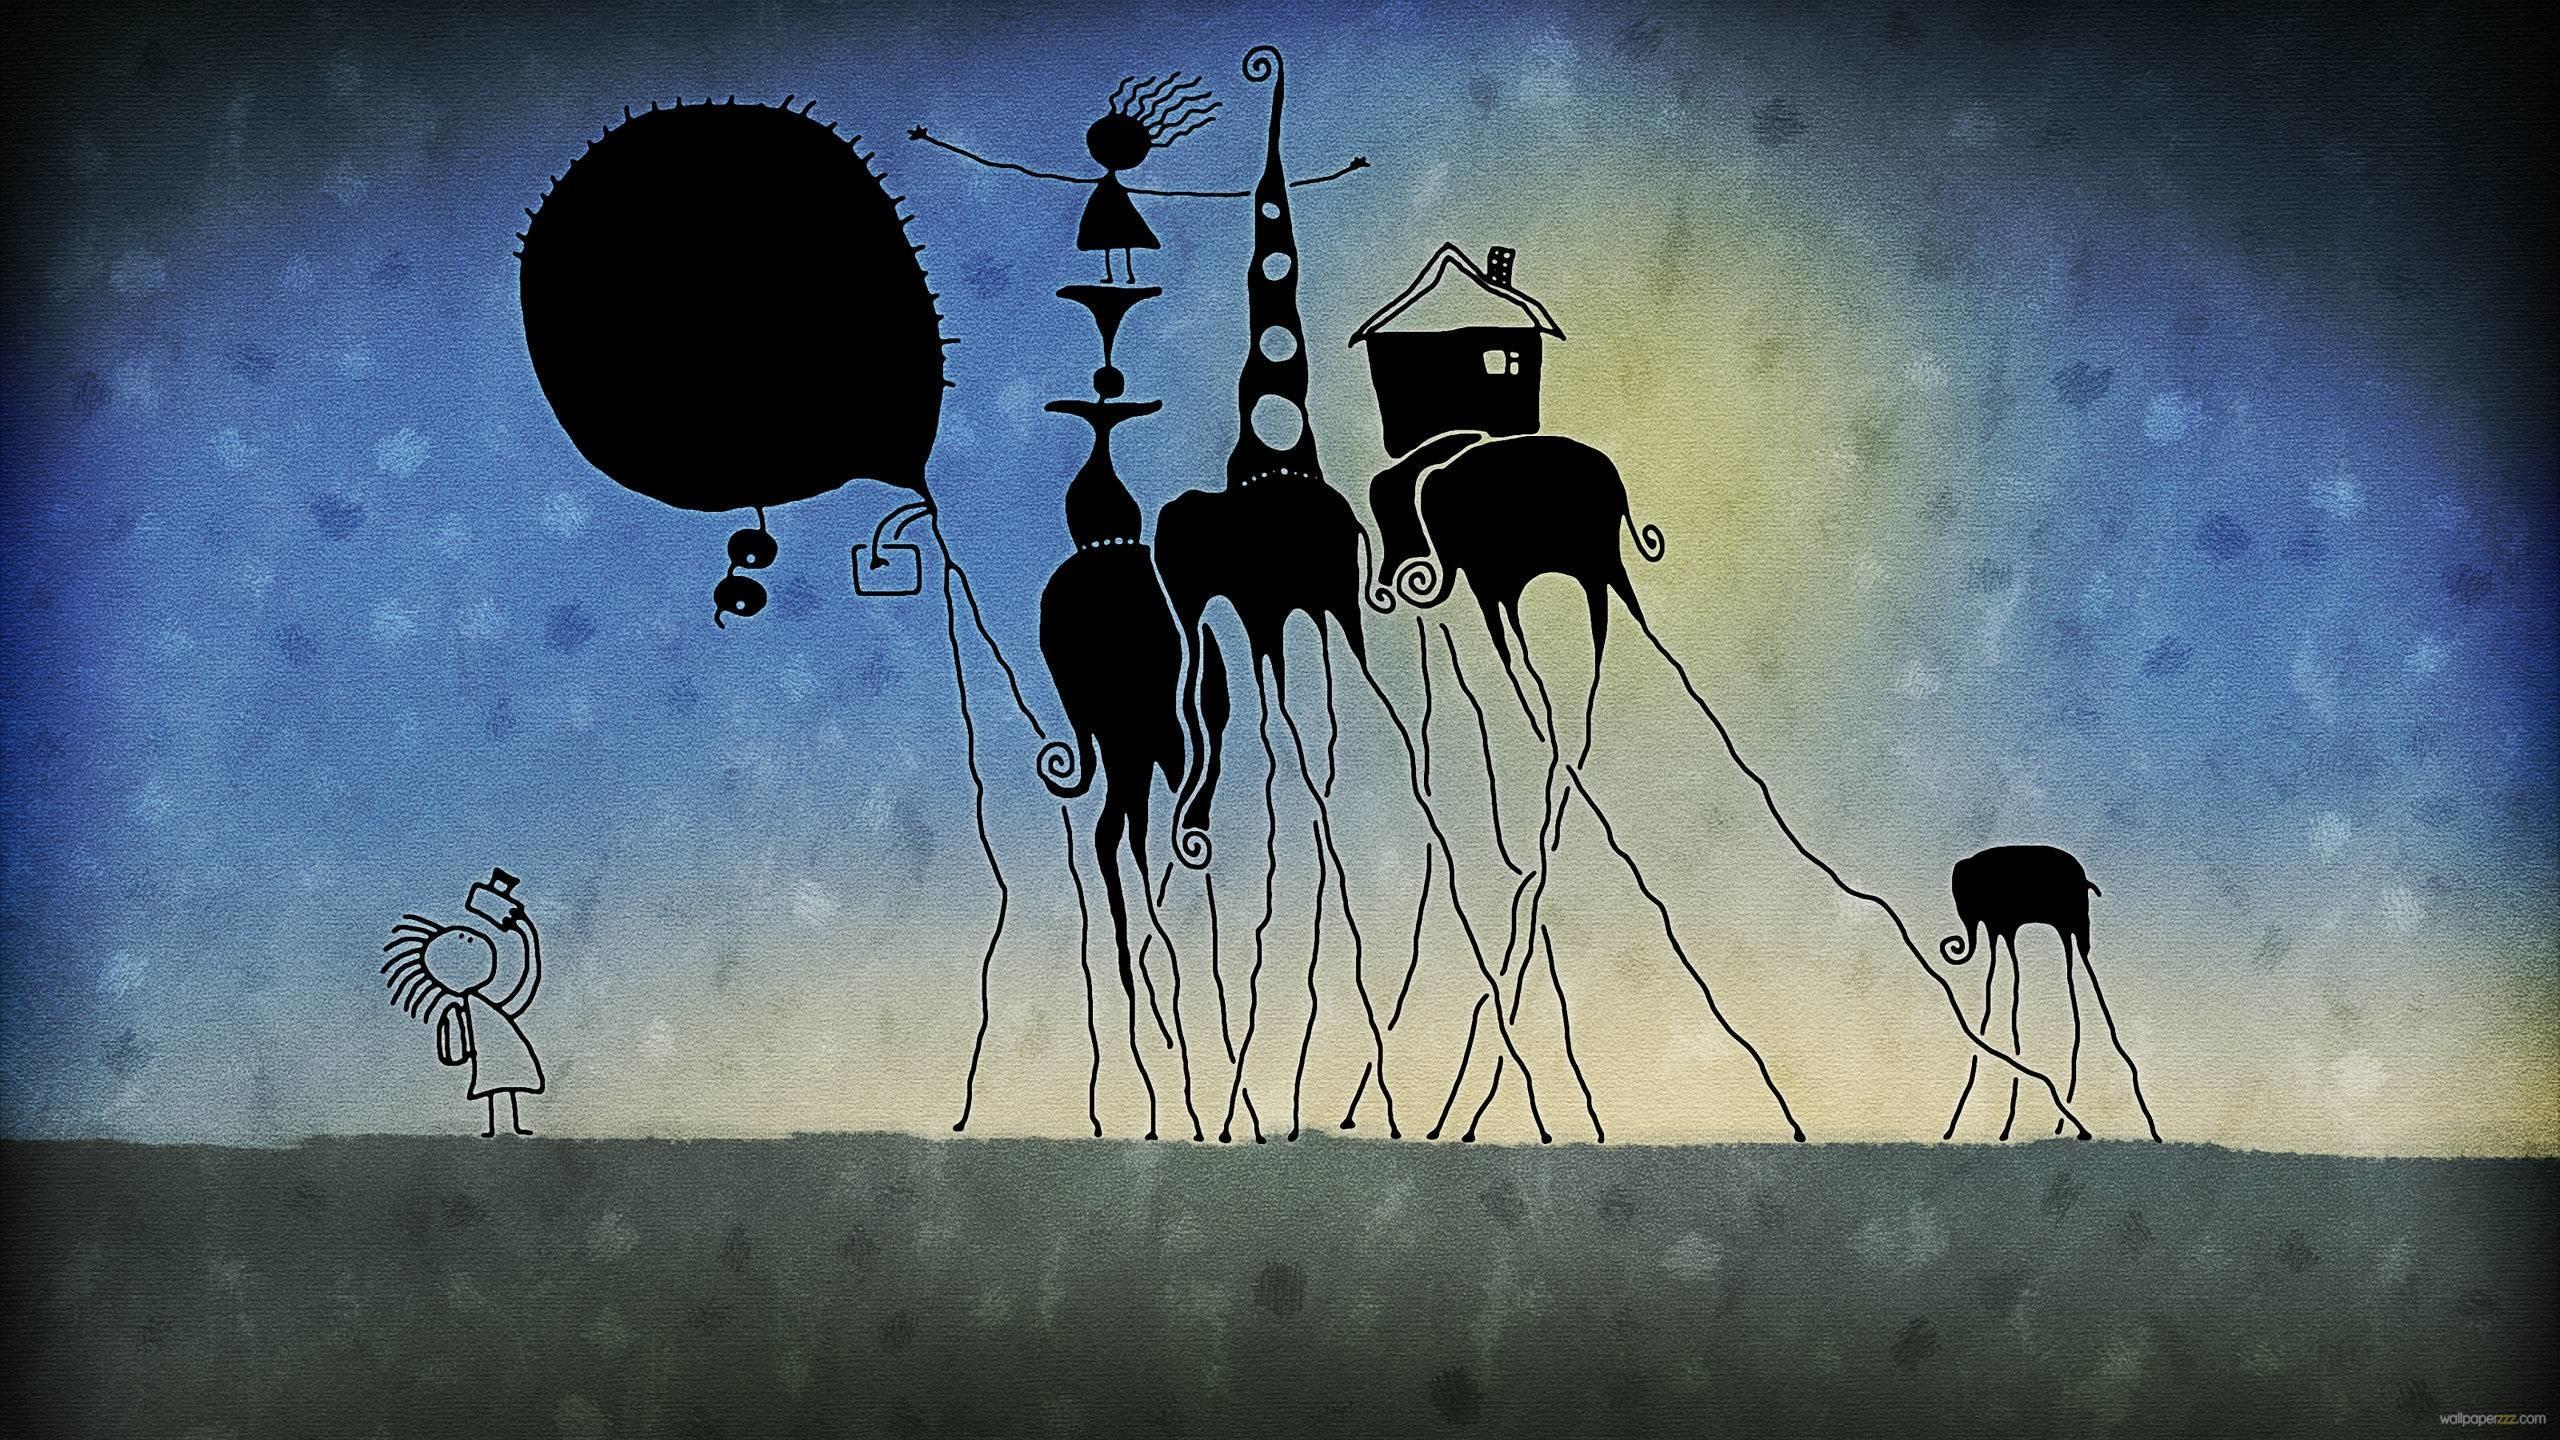 Salvador Dali Wallpapers 1920x1080 (71+ images)